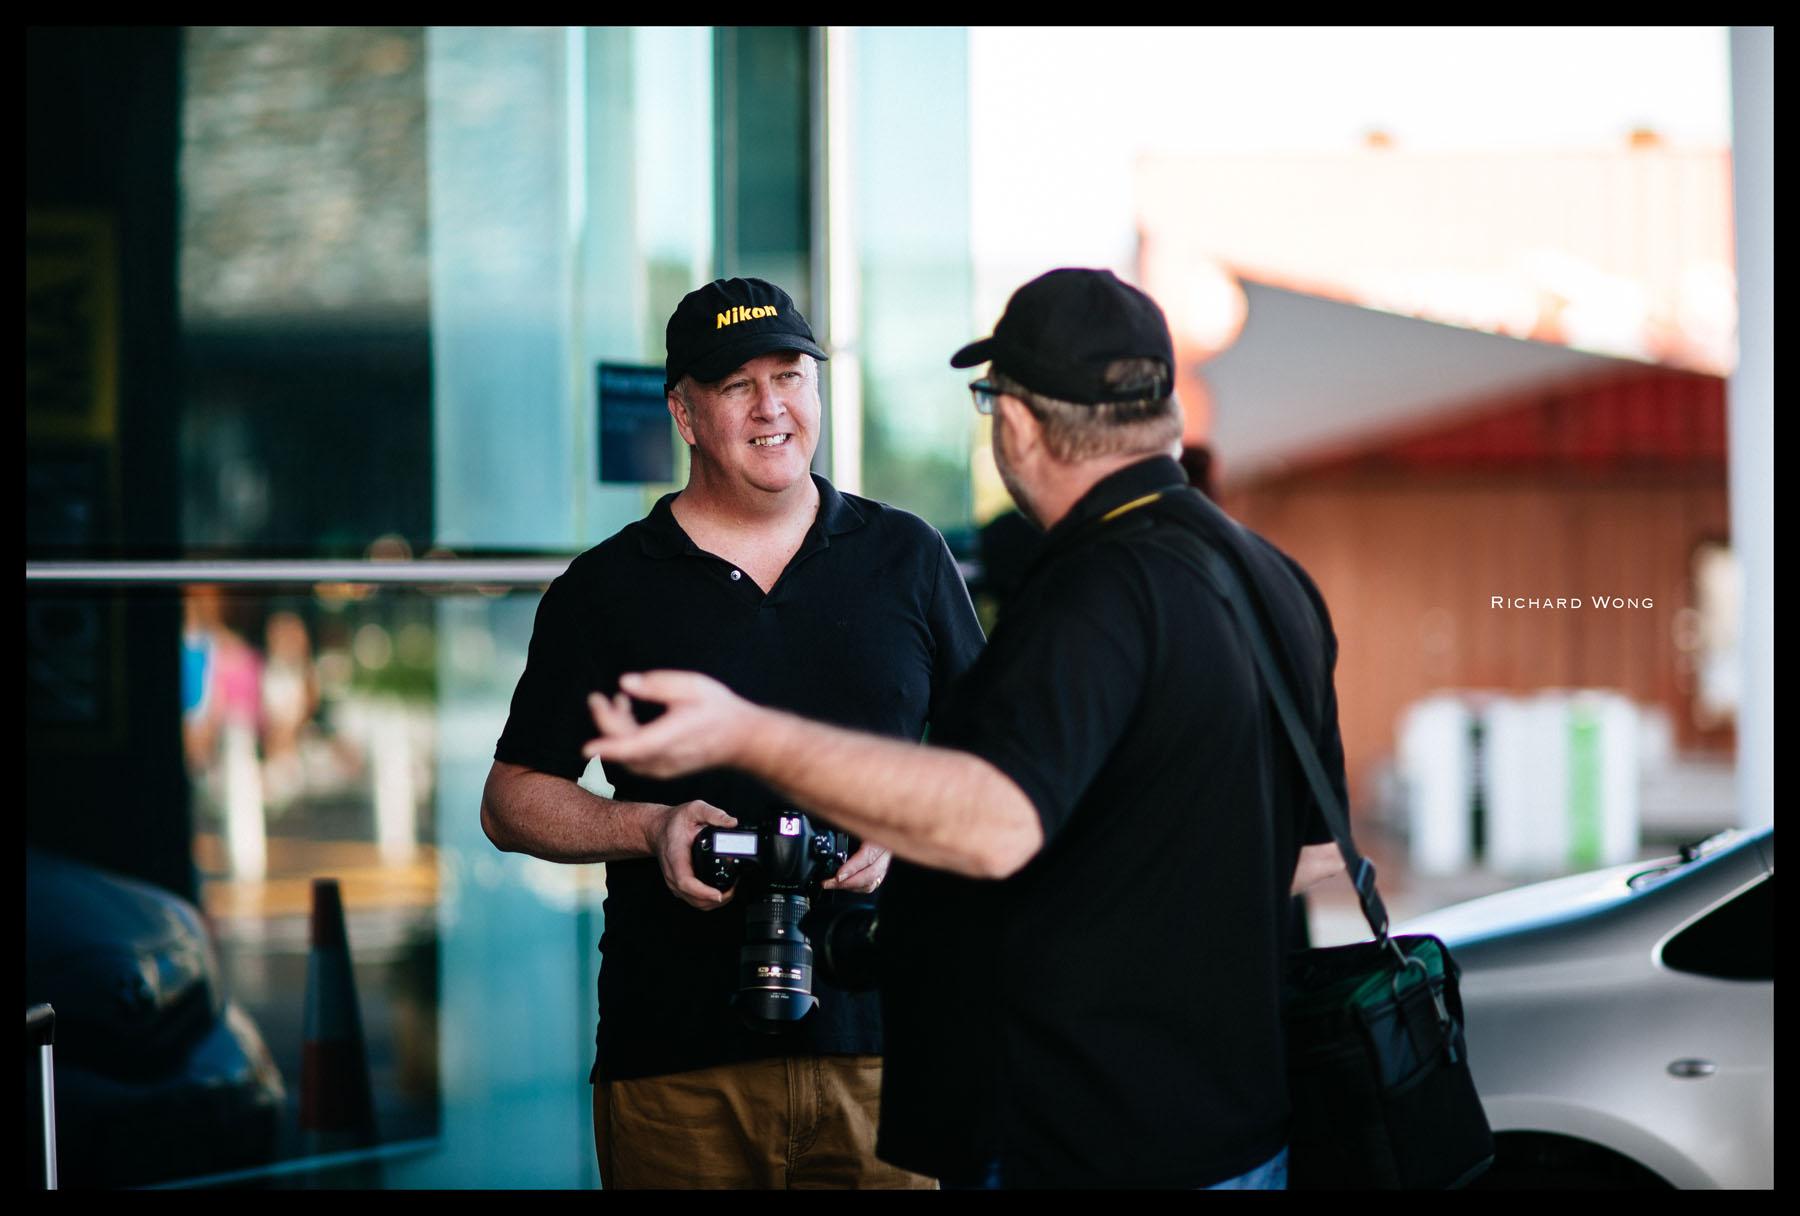 Nikon-Auckland-Photo-Day-2016-02